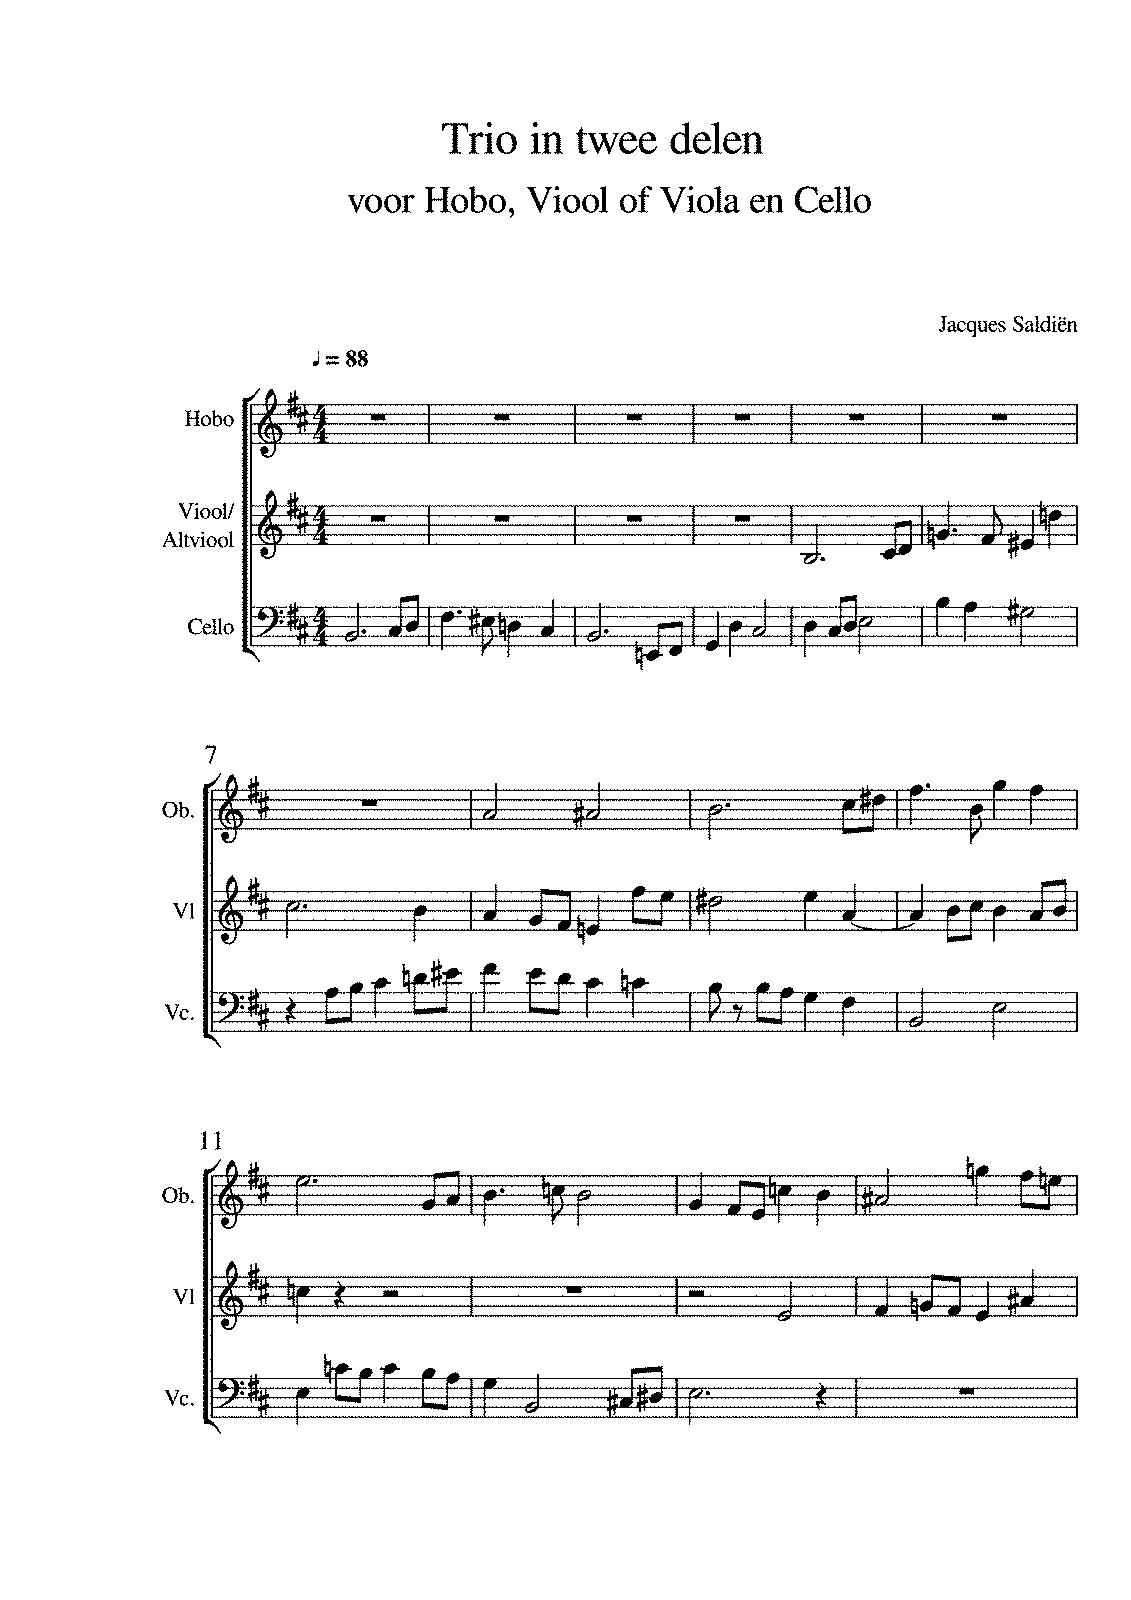 Trio in twee delen (Saldiën, Jacques) - IMSLP/Petrucci Music